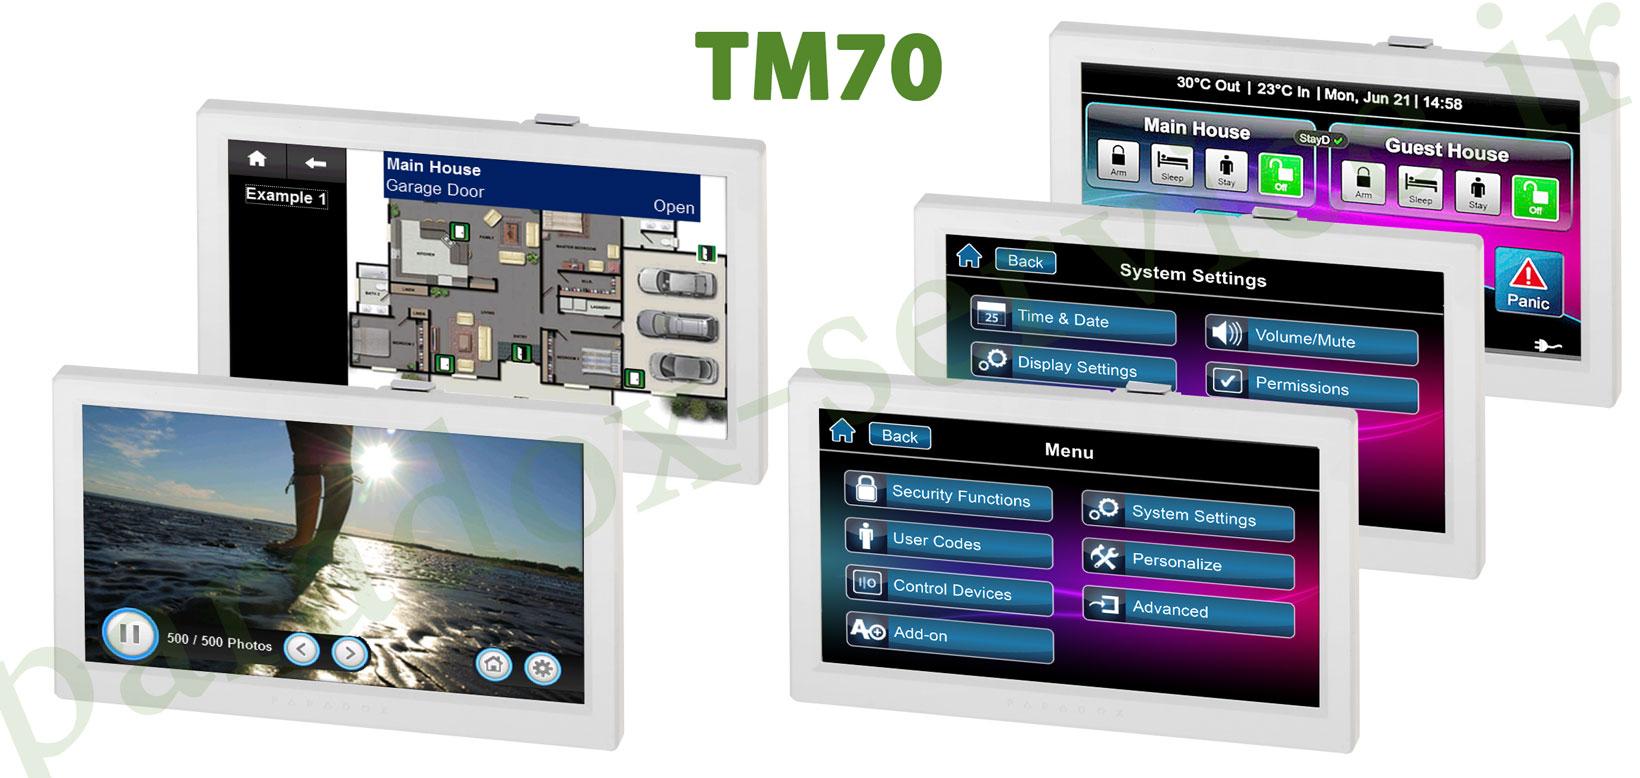 کیپد تاچ اسکرین tm70 دزدگیر شرکت پارادوکس کانادا paradox کیپد تاچ اسکرین TM70 دزدگیر شرکت پارادوکس کانادا Paradox TM70 baner Install